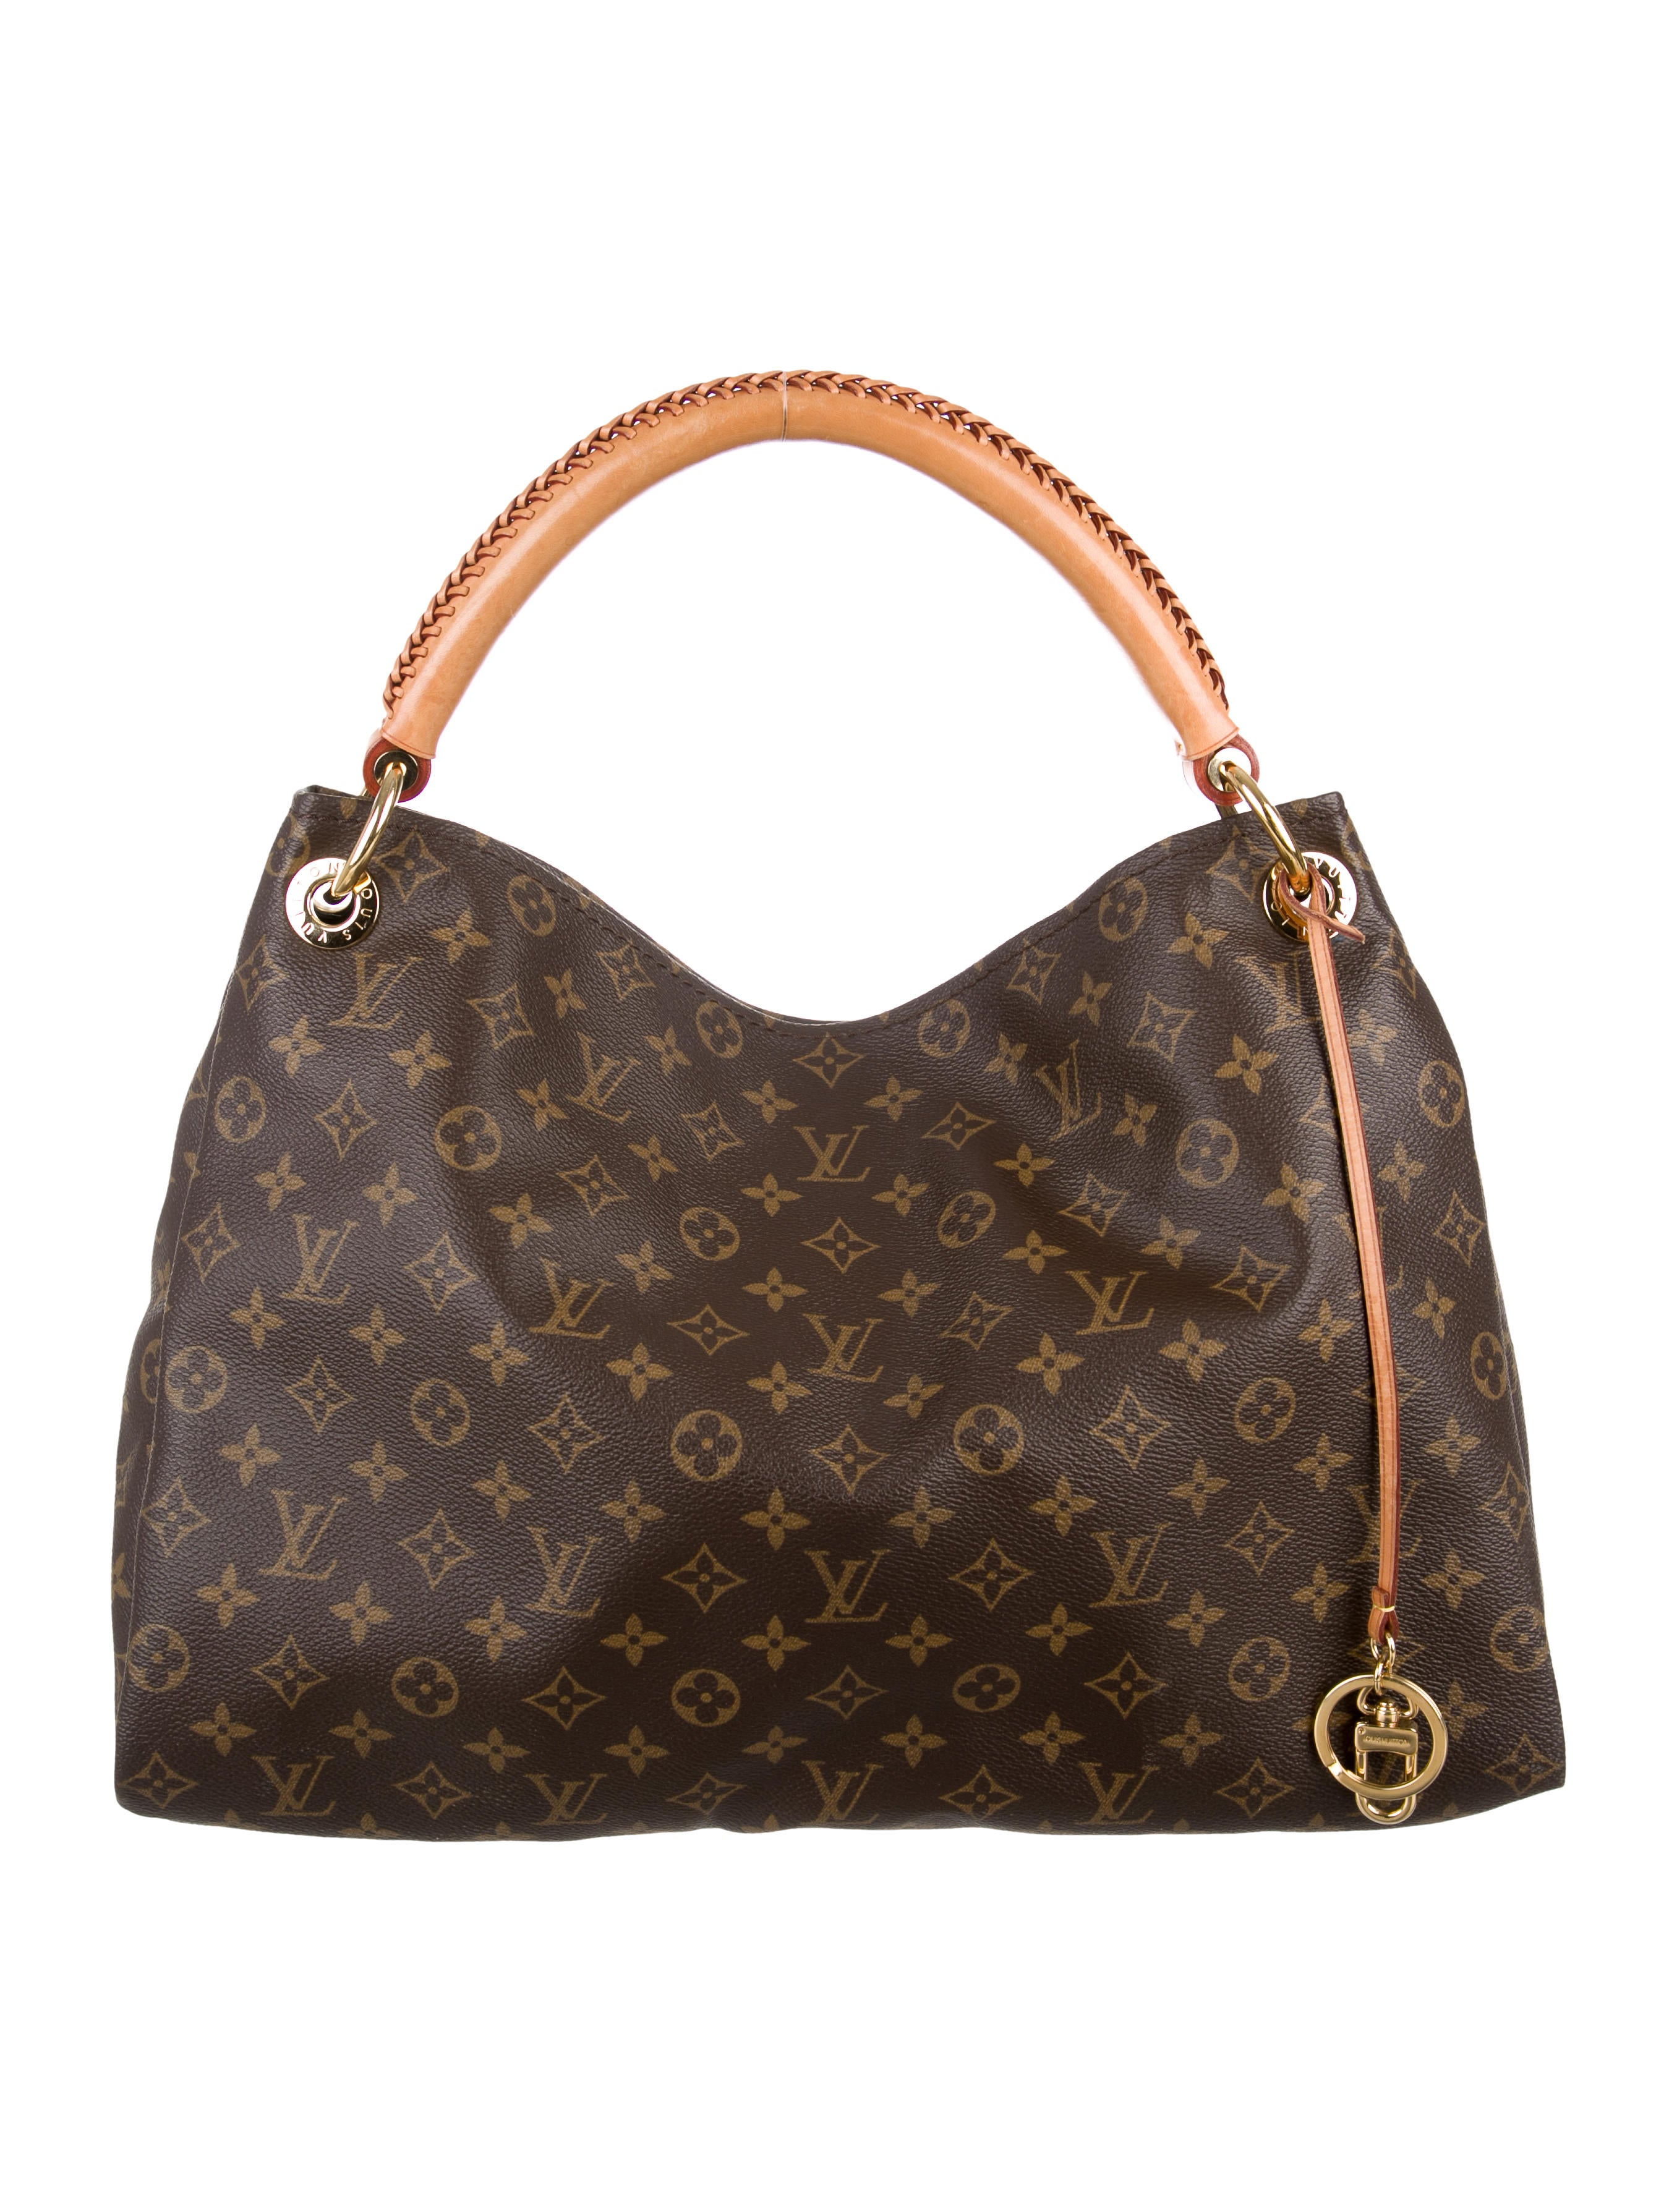 6c454e07e8 Louis Vuitton Monogram Berri MM - Handbags - LOU215870 | The RealReal